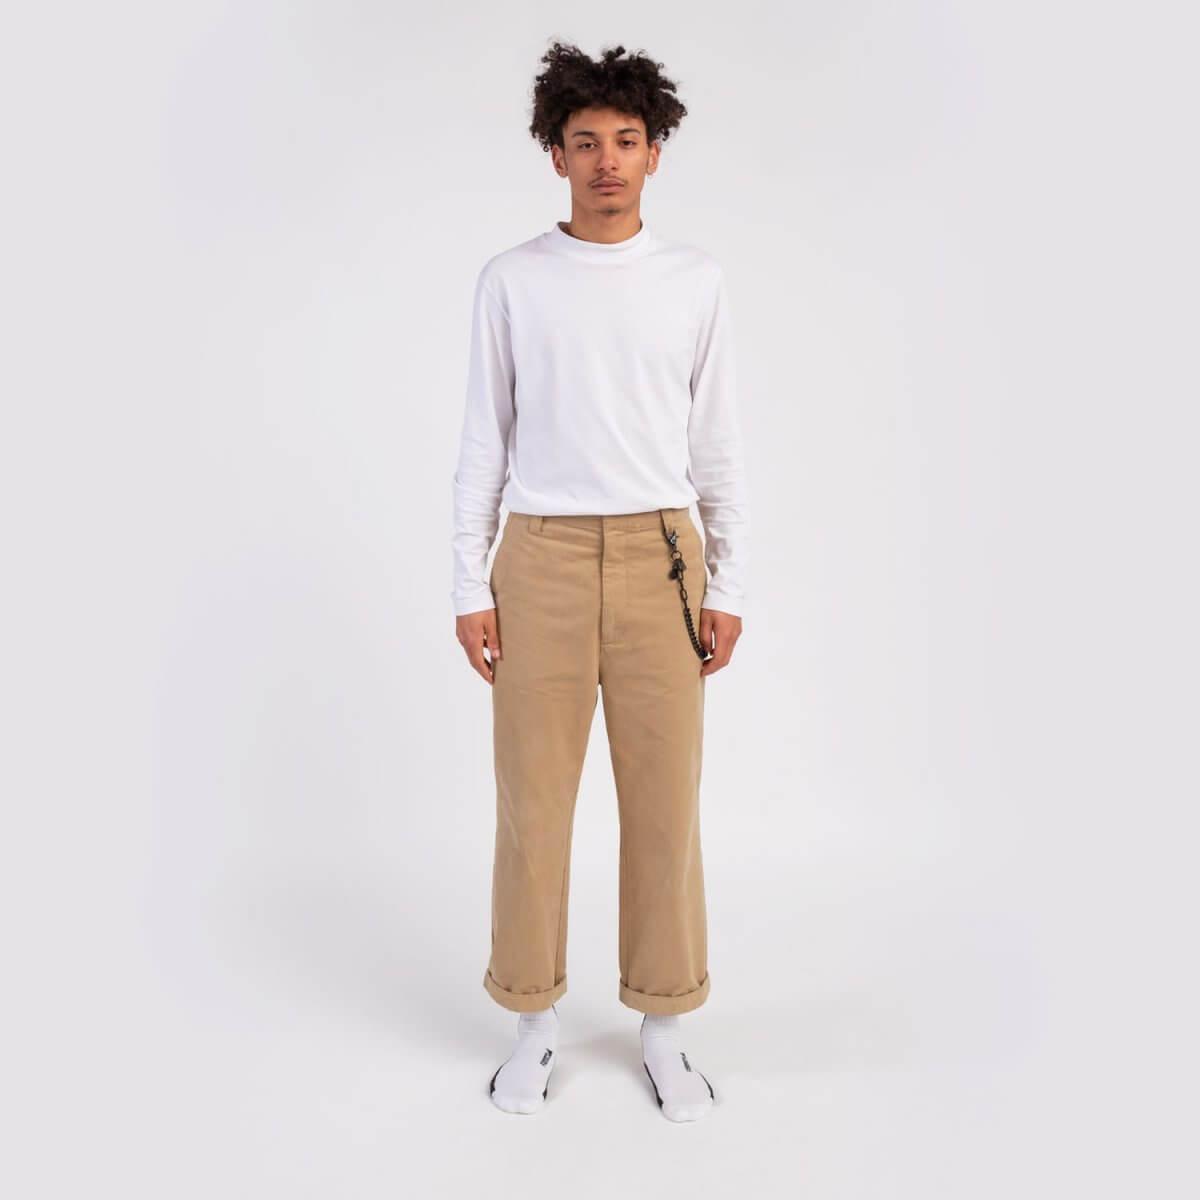 catena-nera-pantalone-ragazzo-fabbrica